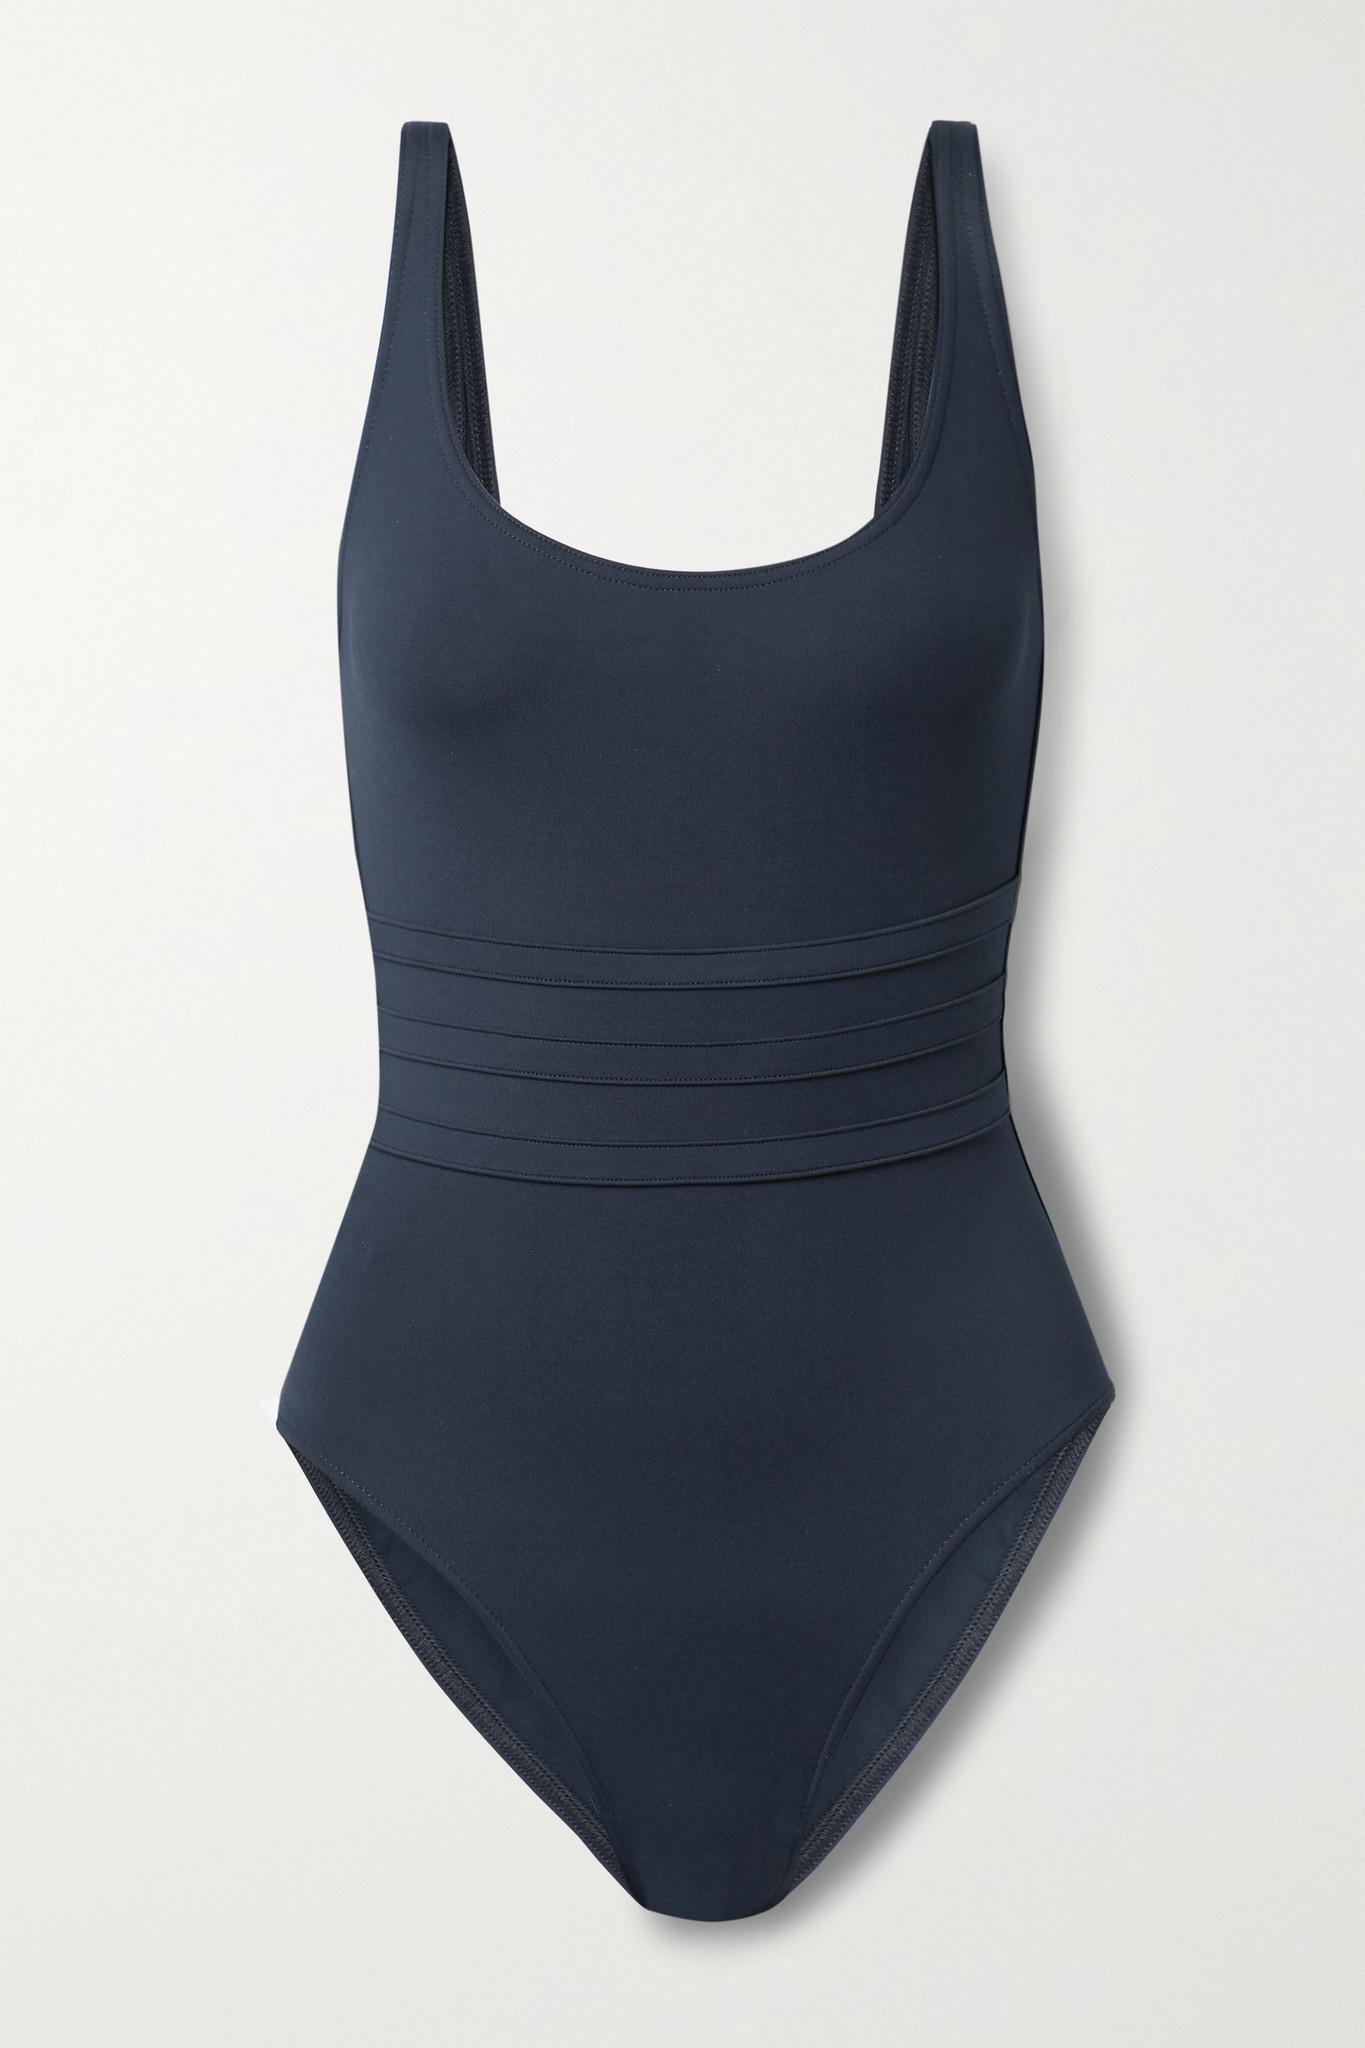 ERES - Les Essentials Asia Swimsuit - Blue - FR44